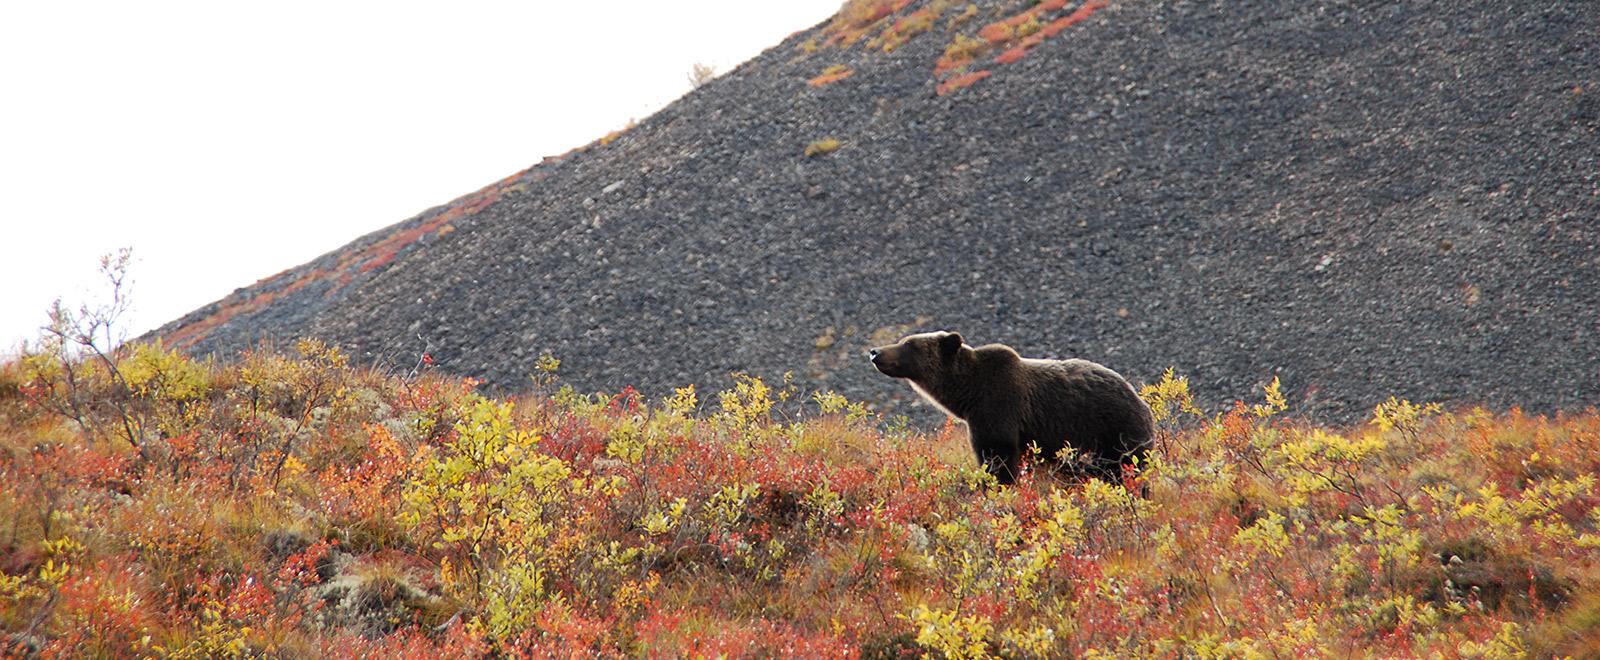 yukon wildlife bear